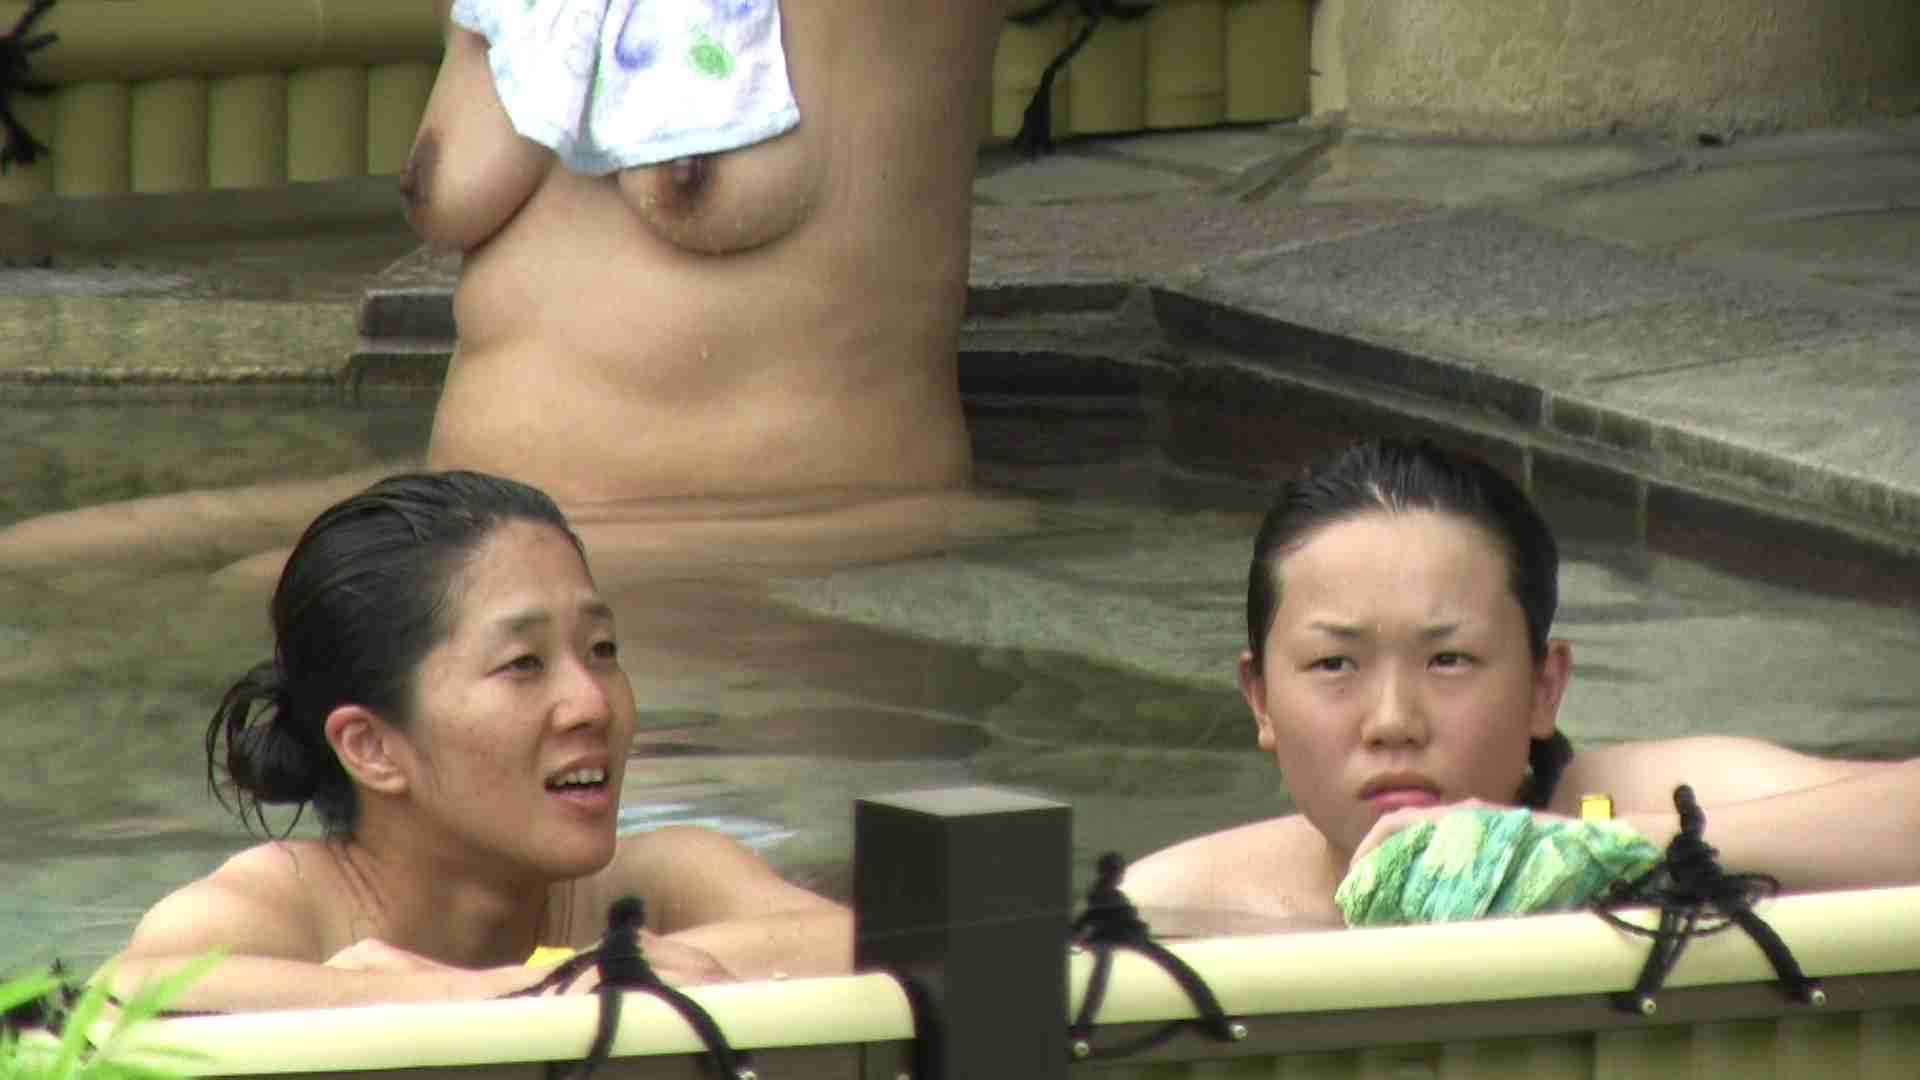 Aquaな露天風呂Vol.205 OLセックス 覗き性交動画流出 105画像 44